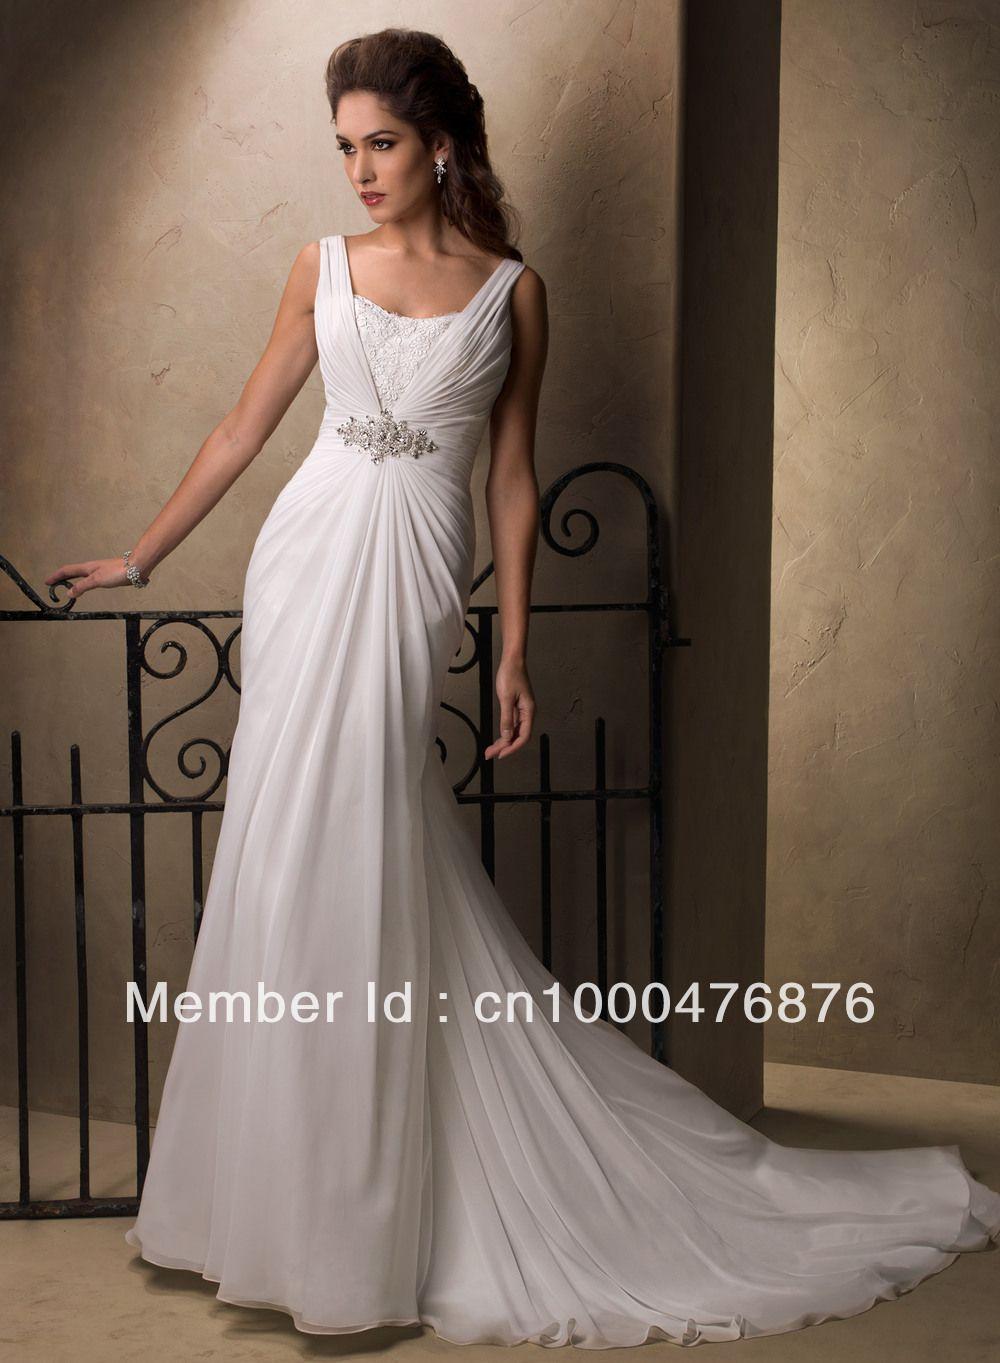 Pin by heather white on wedding dreams pinterest wedding dresses